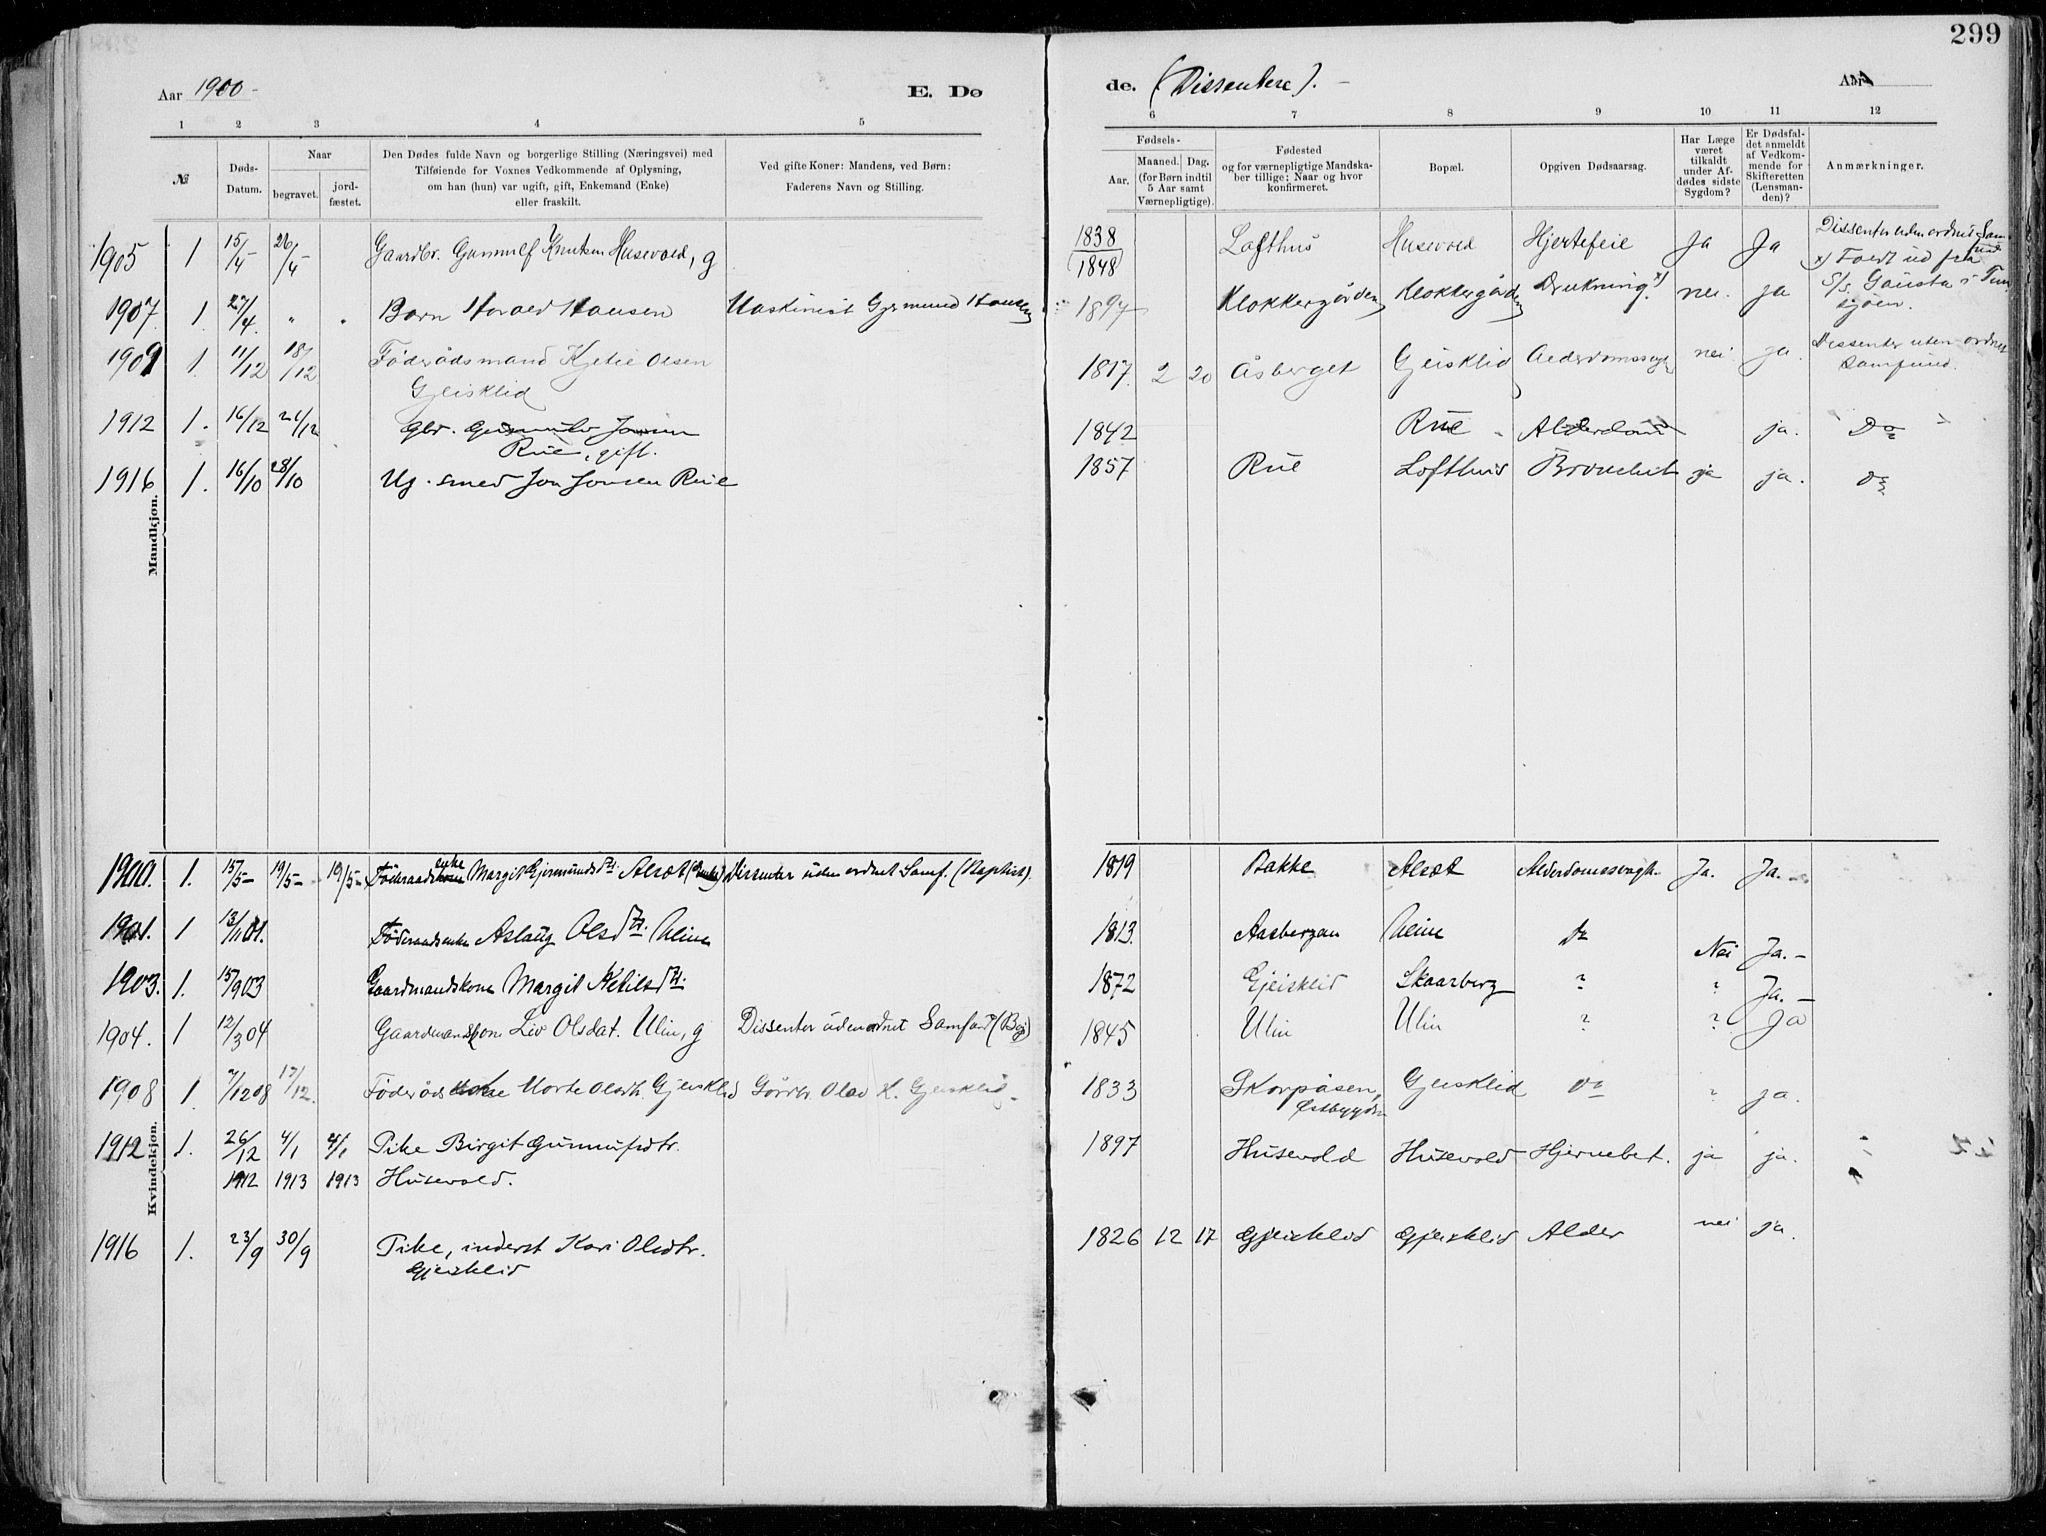 SAKO, Tinn kirkebøker, F/Fa/L0007: Ministerialbok nr. I 7, 1878-1922, s. 299